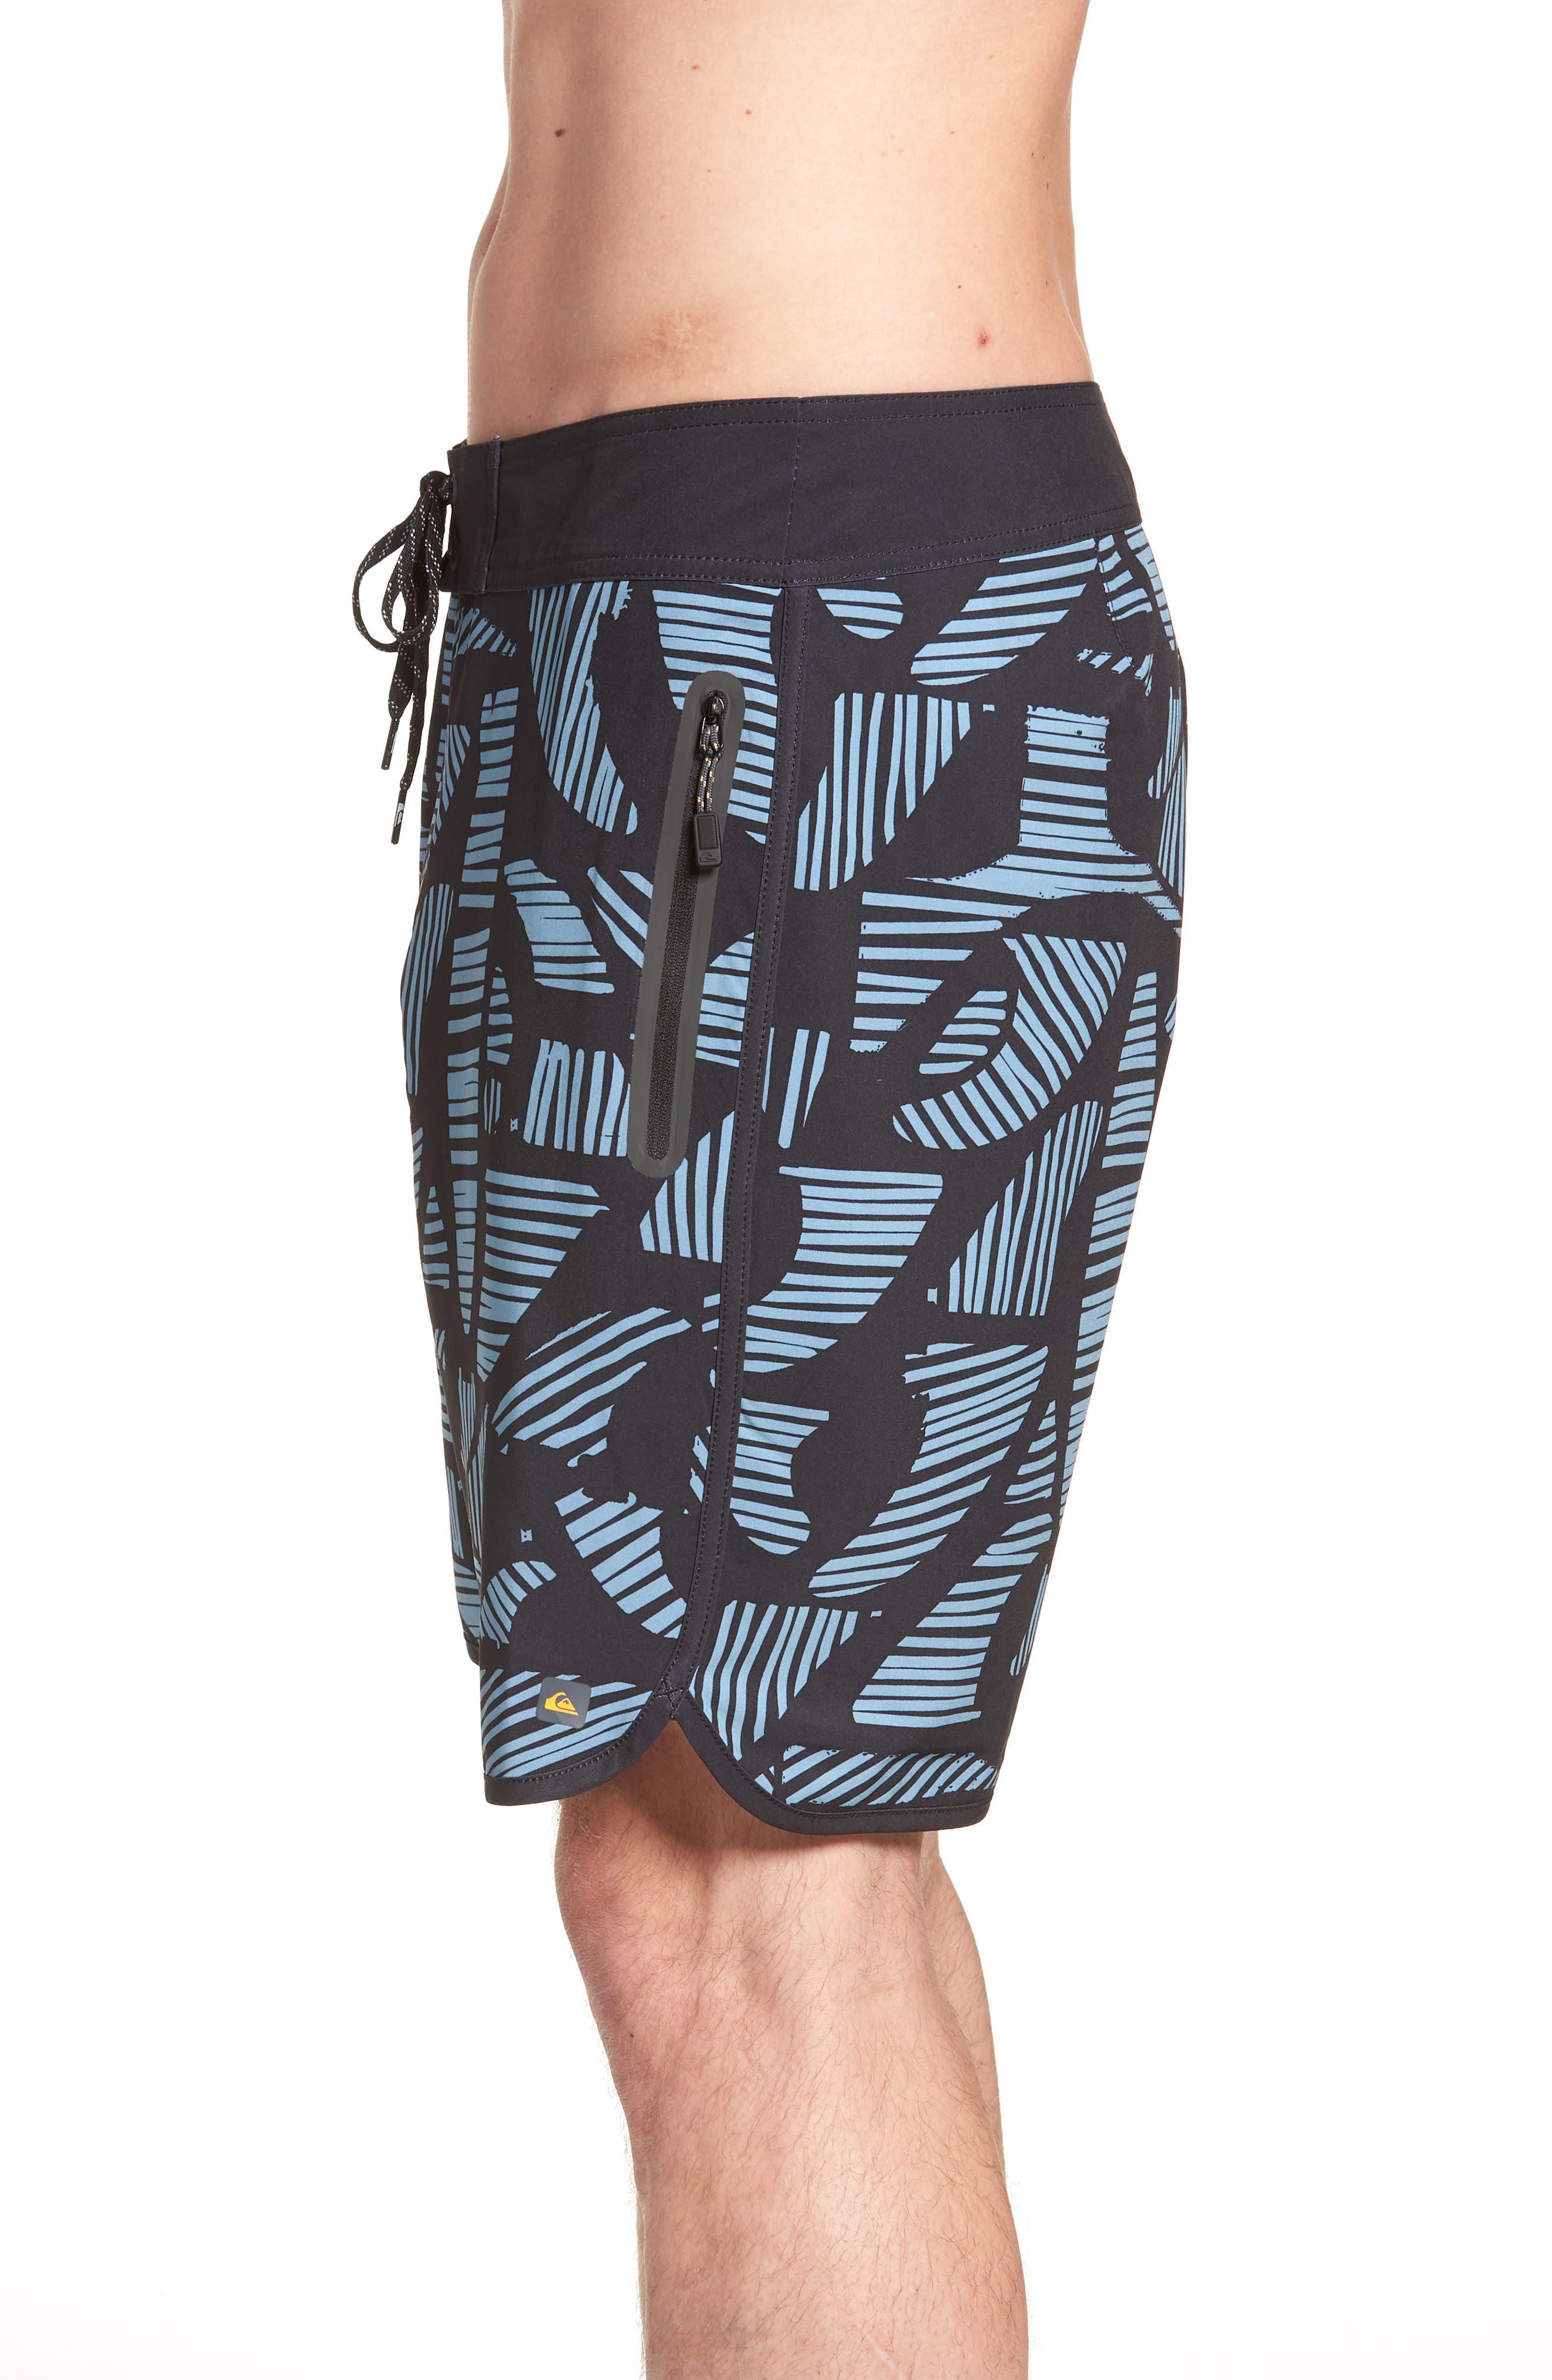 Odysea Board Shorts,                             Alternate thumbnail 5, color,                             Black